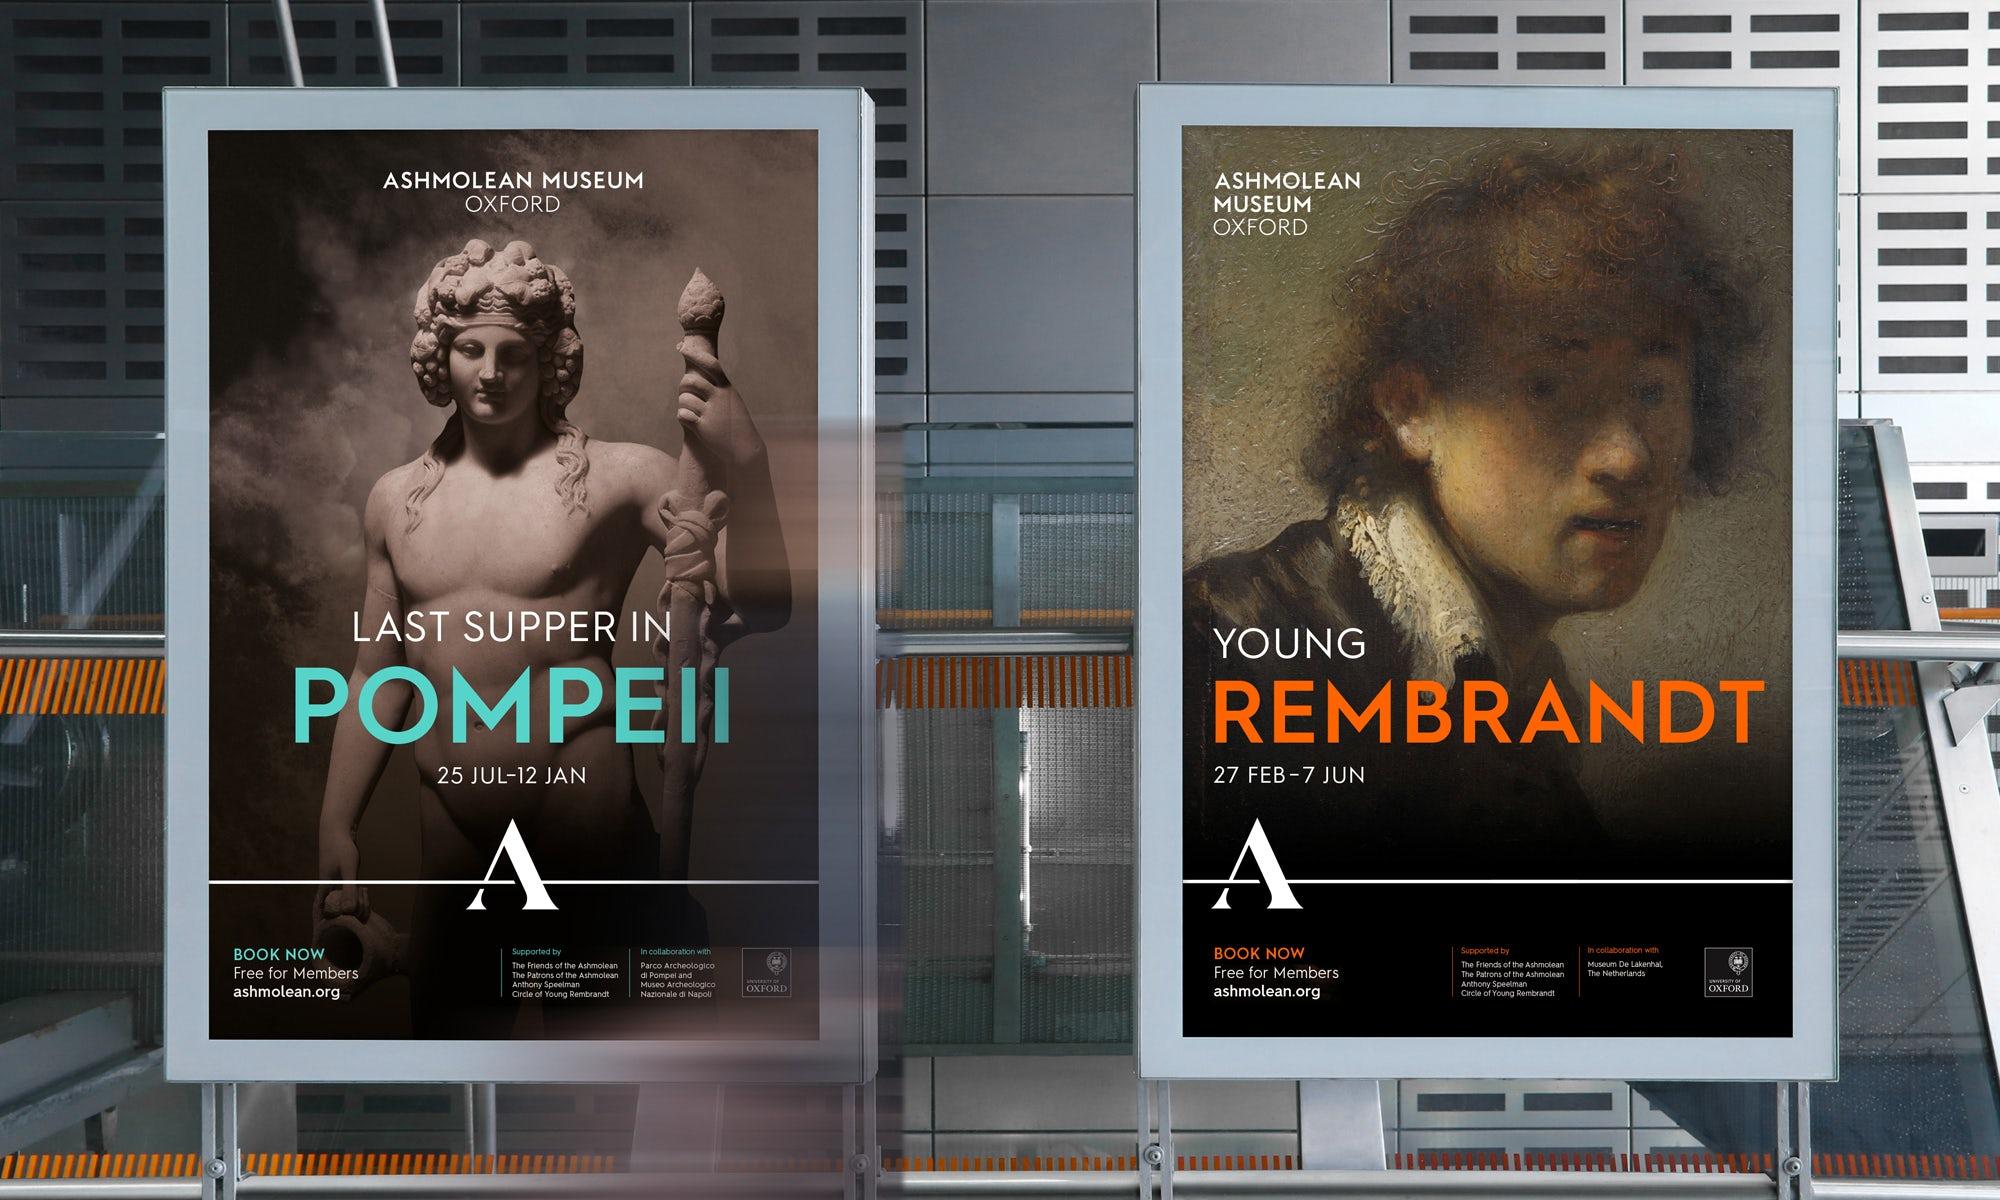 Ashmolean exhibition posters